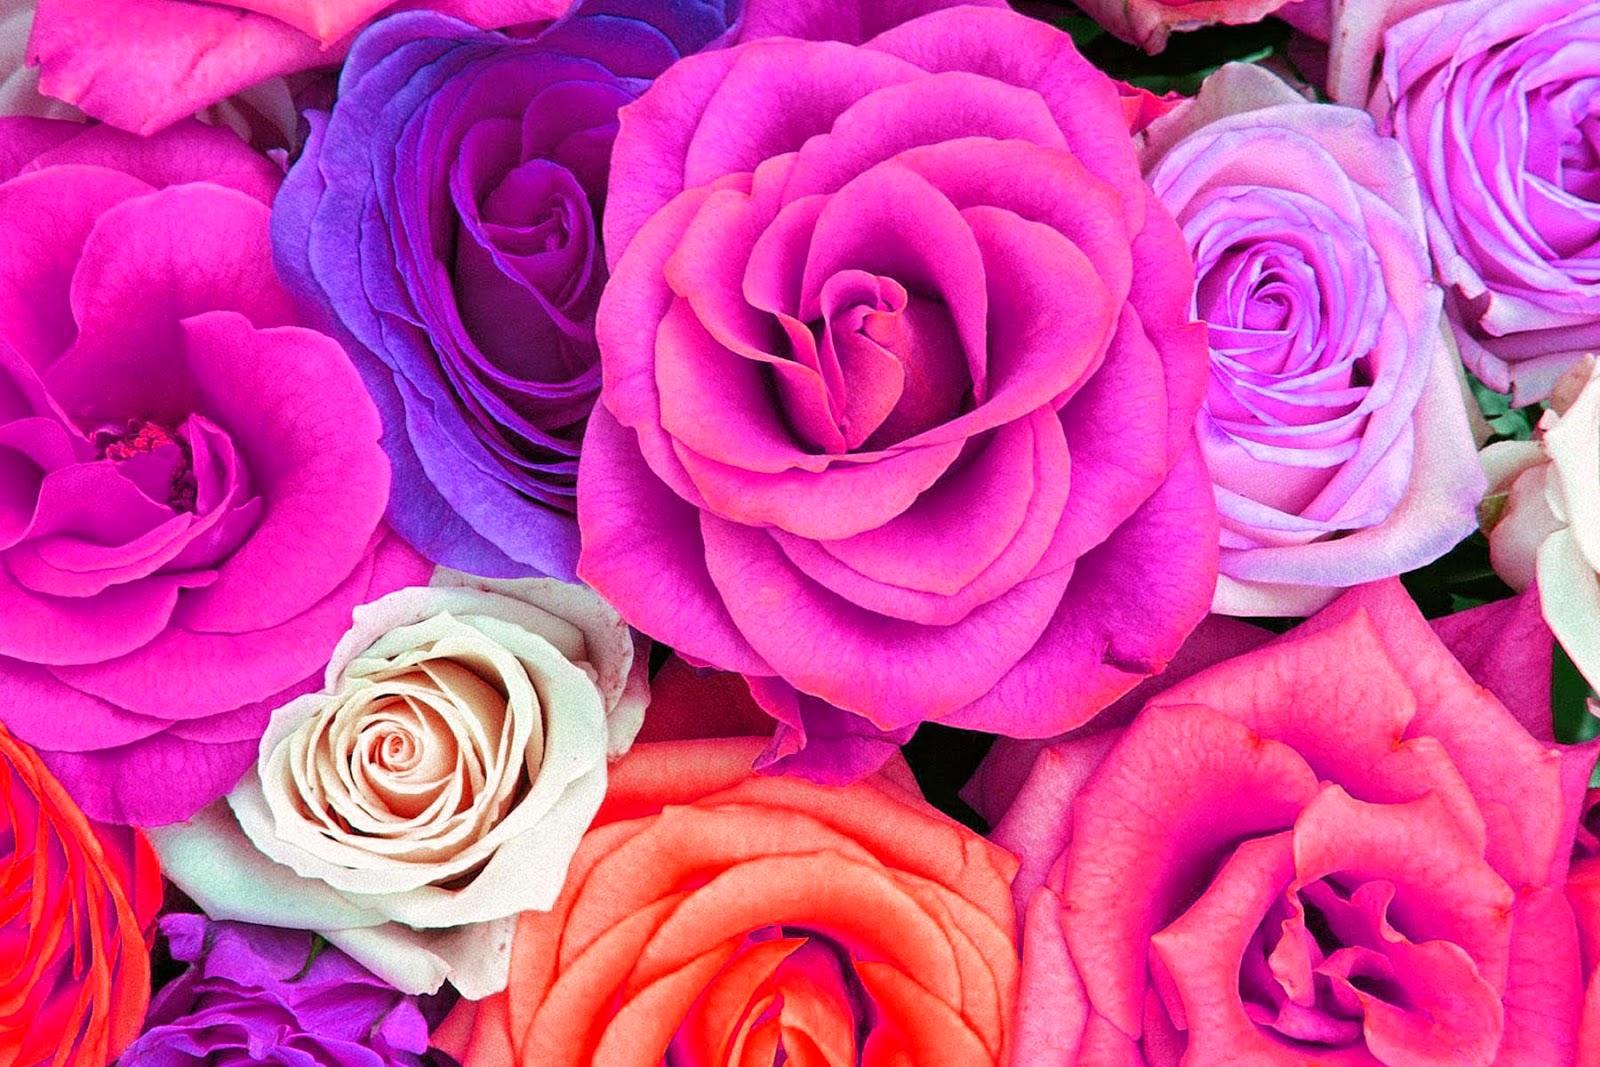 magenta roses wallpaper - photo #4